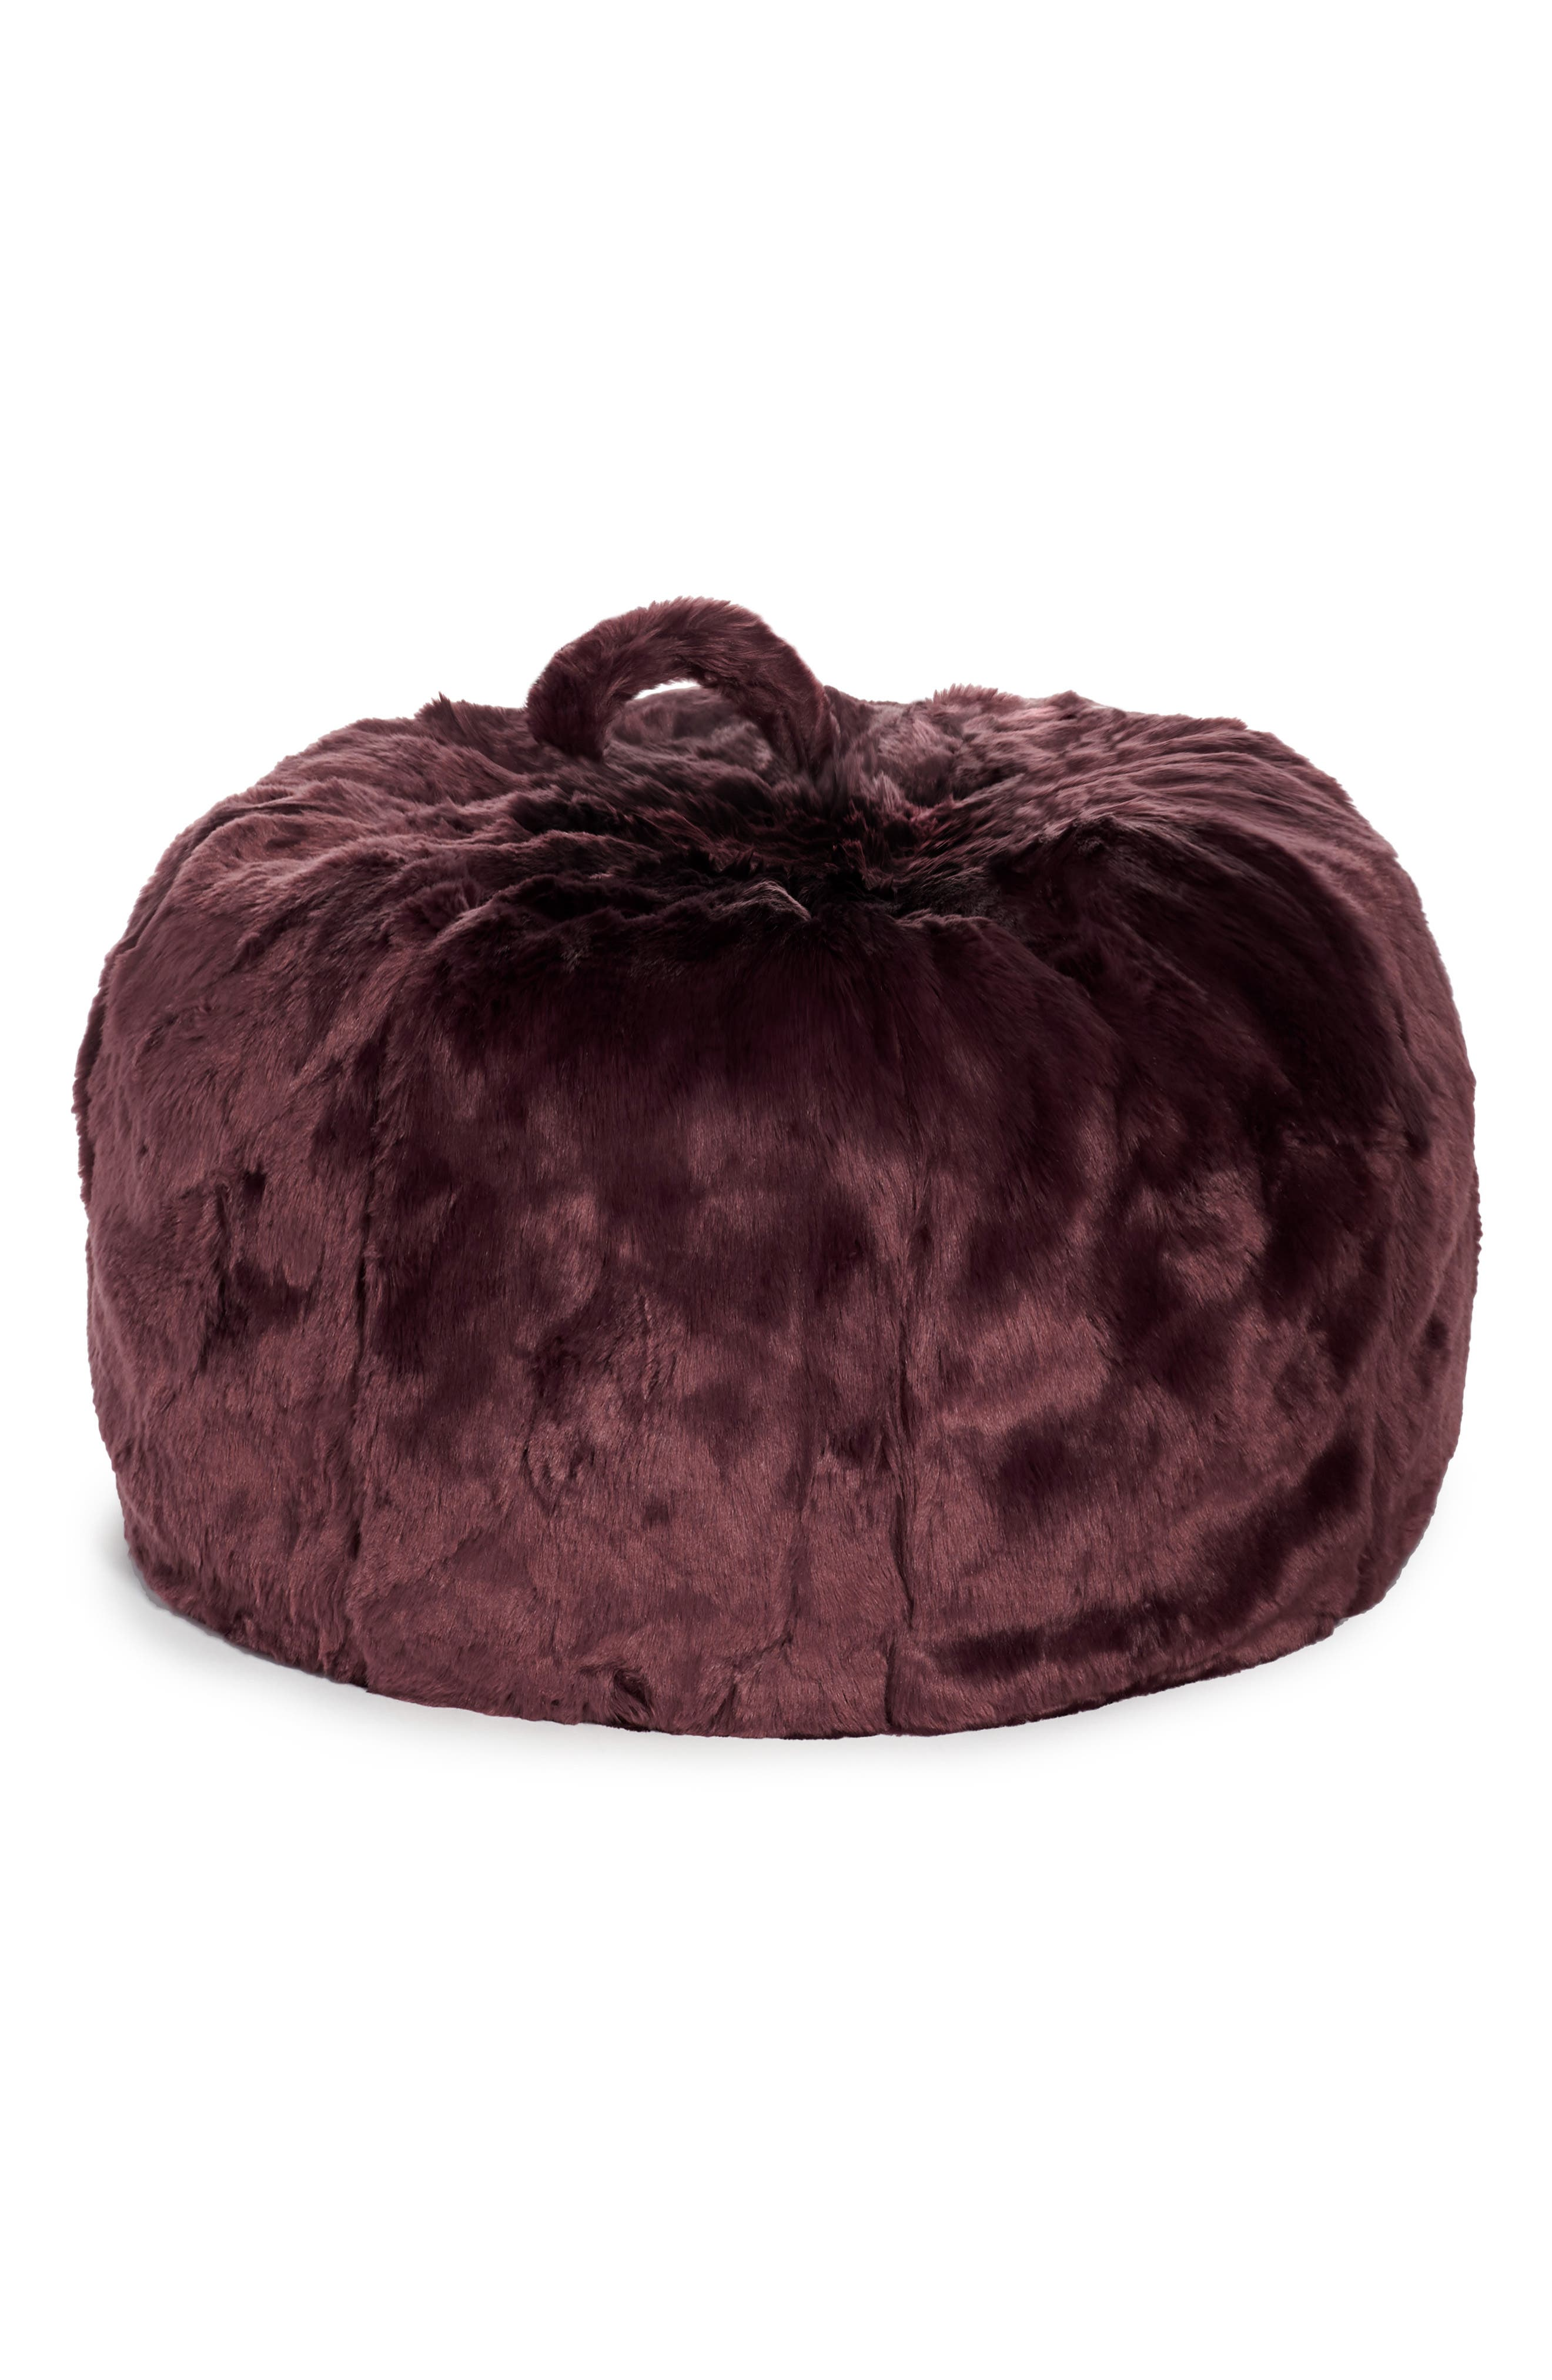 Cuddle-Up Faux Fur Beanbag Chair,                             Main thumbnail 1, color,                             BURGUNDY STEM